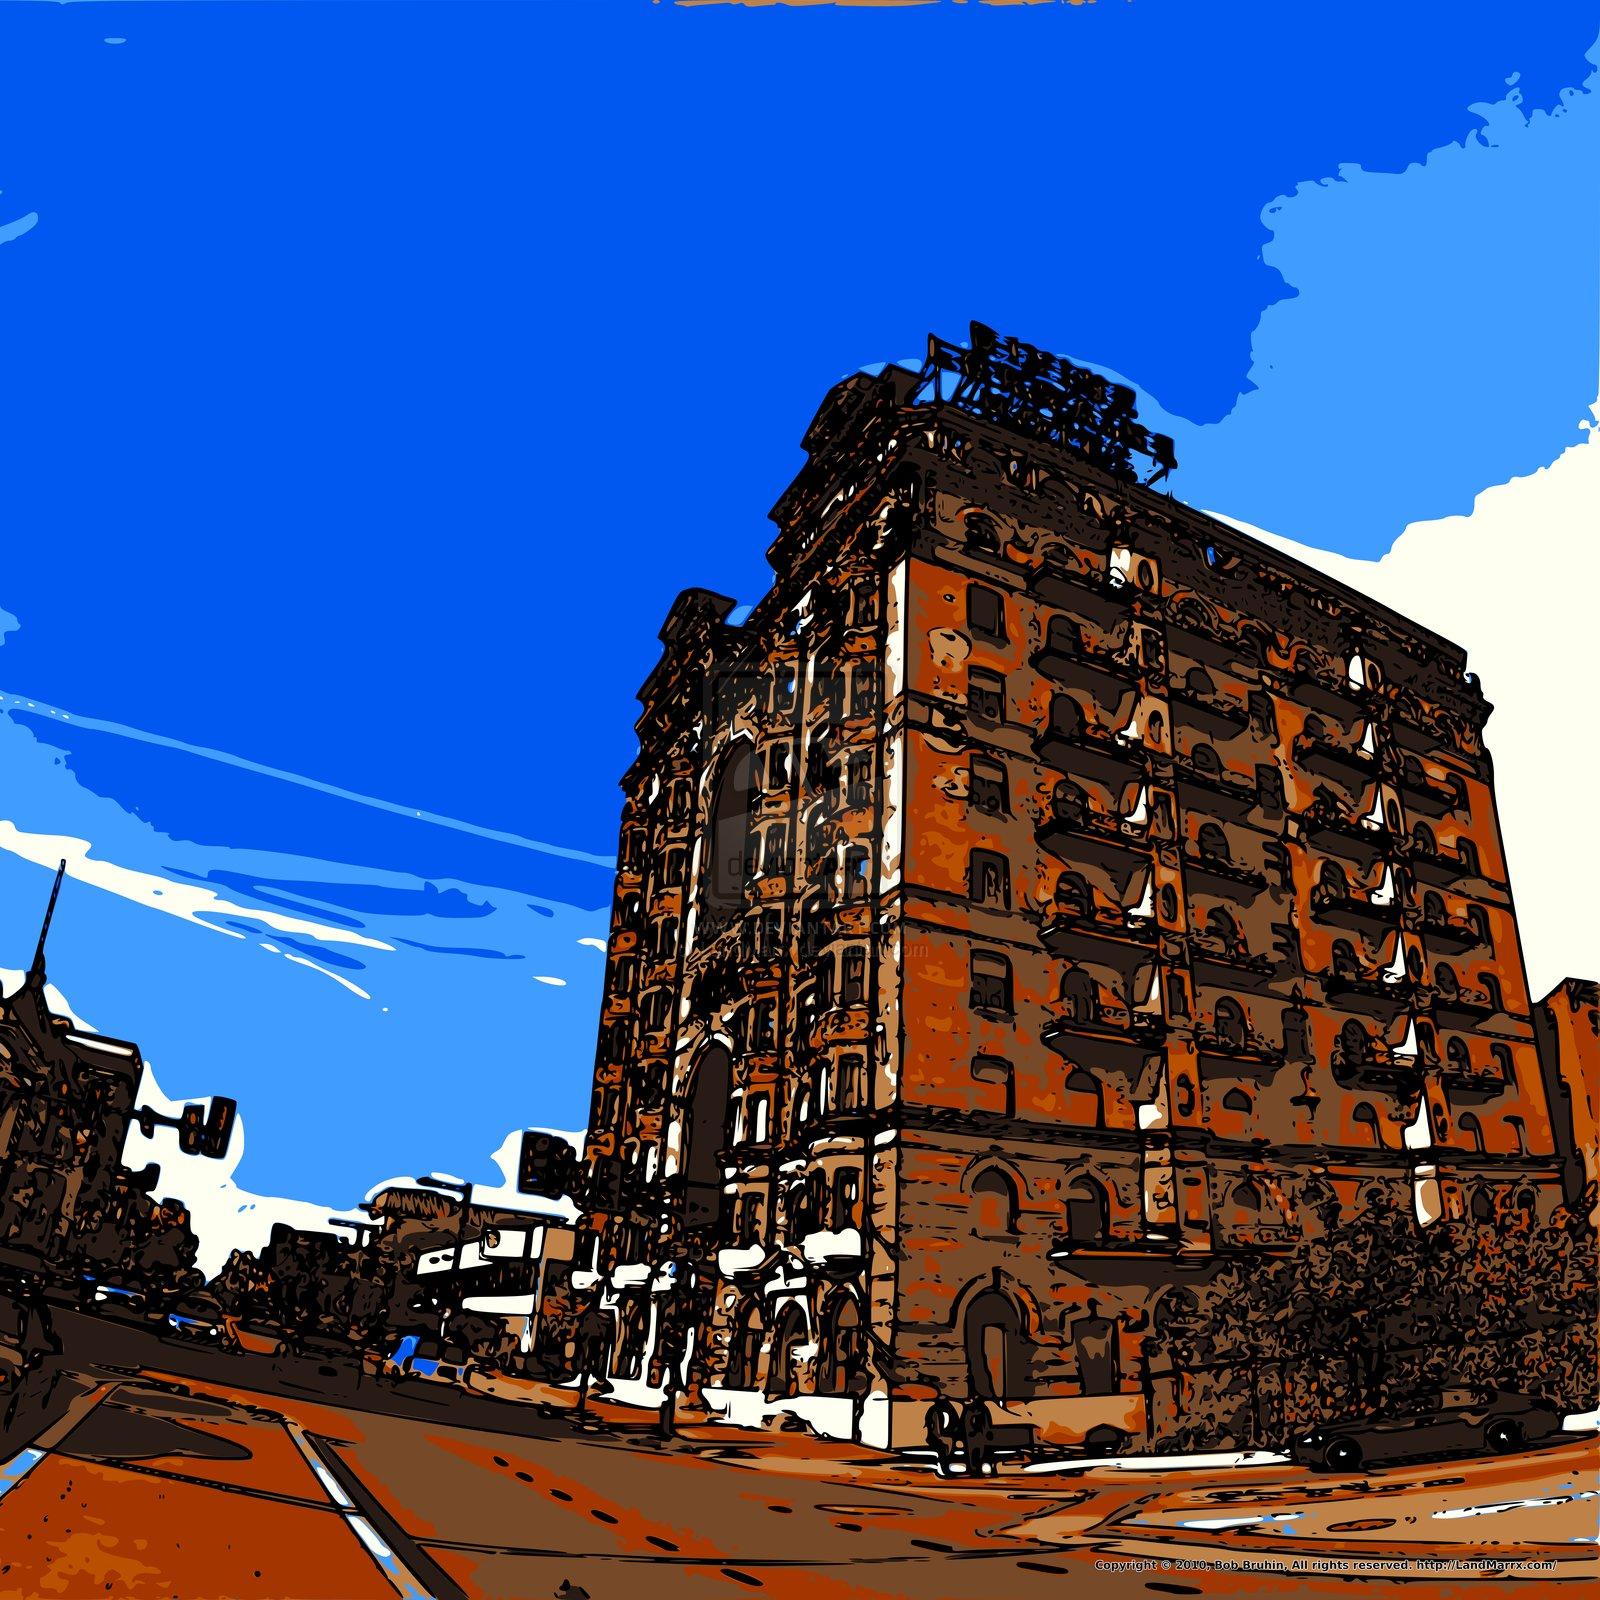 Sunset Hotel by LandMarrx on deviantART